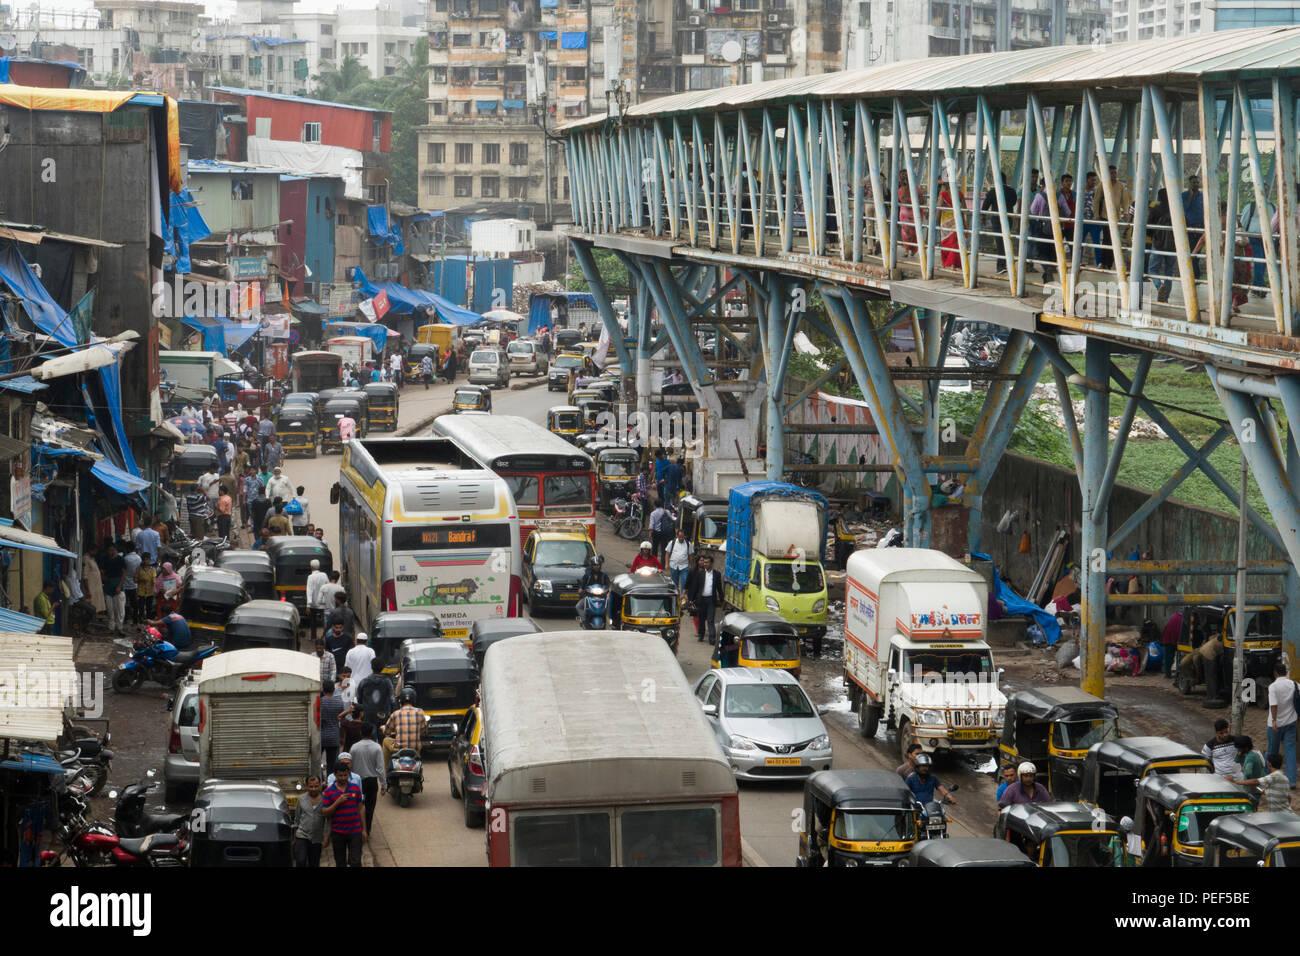 Busy traffic scene with Bandra skywalk pedestrian walkway above at Station road, Mumbai, India - Stock Image